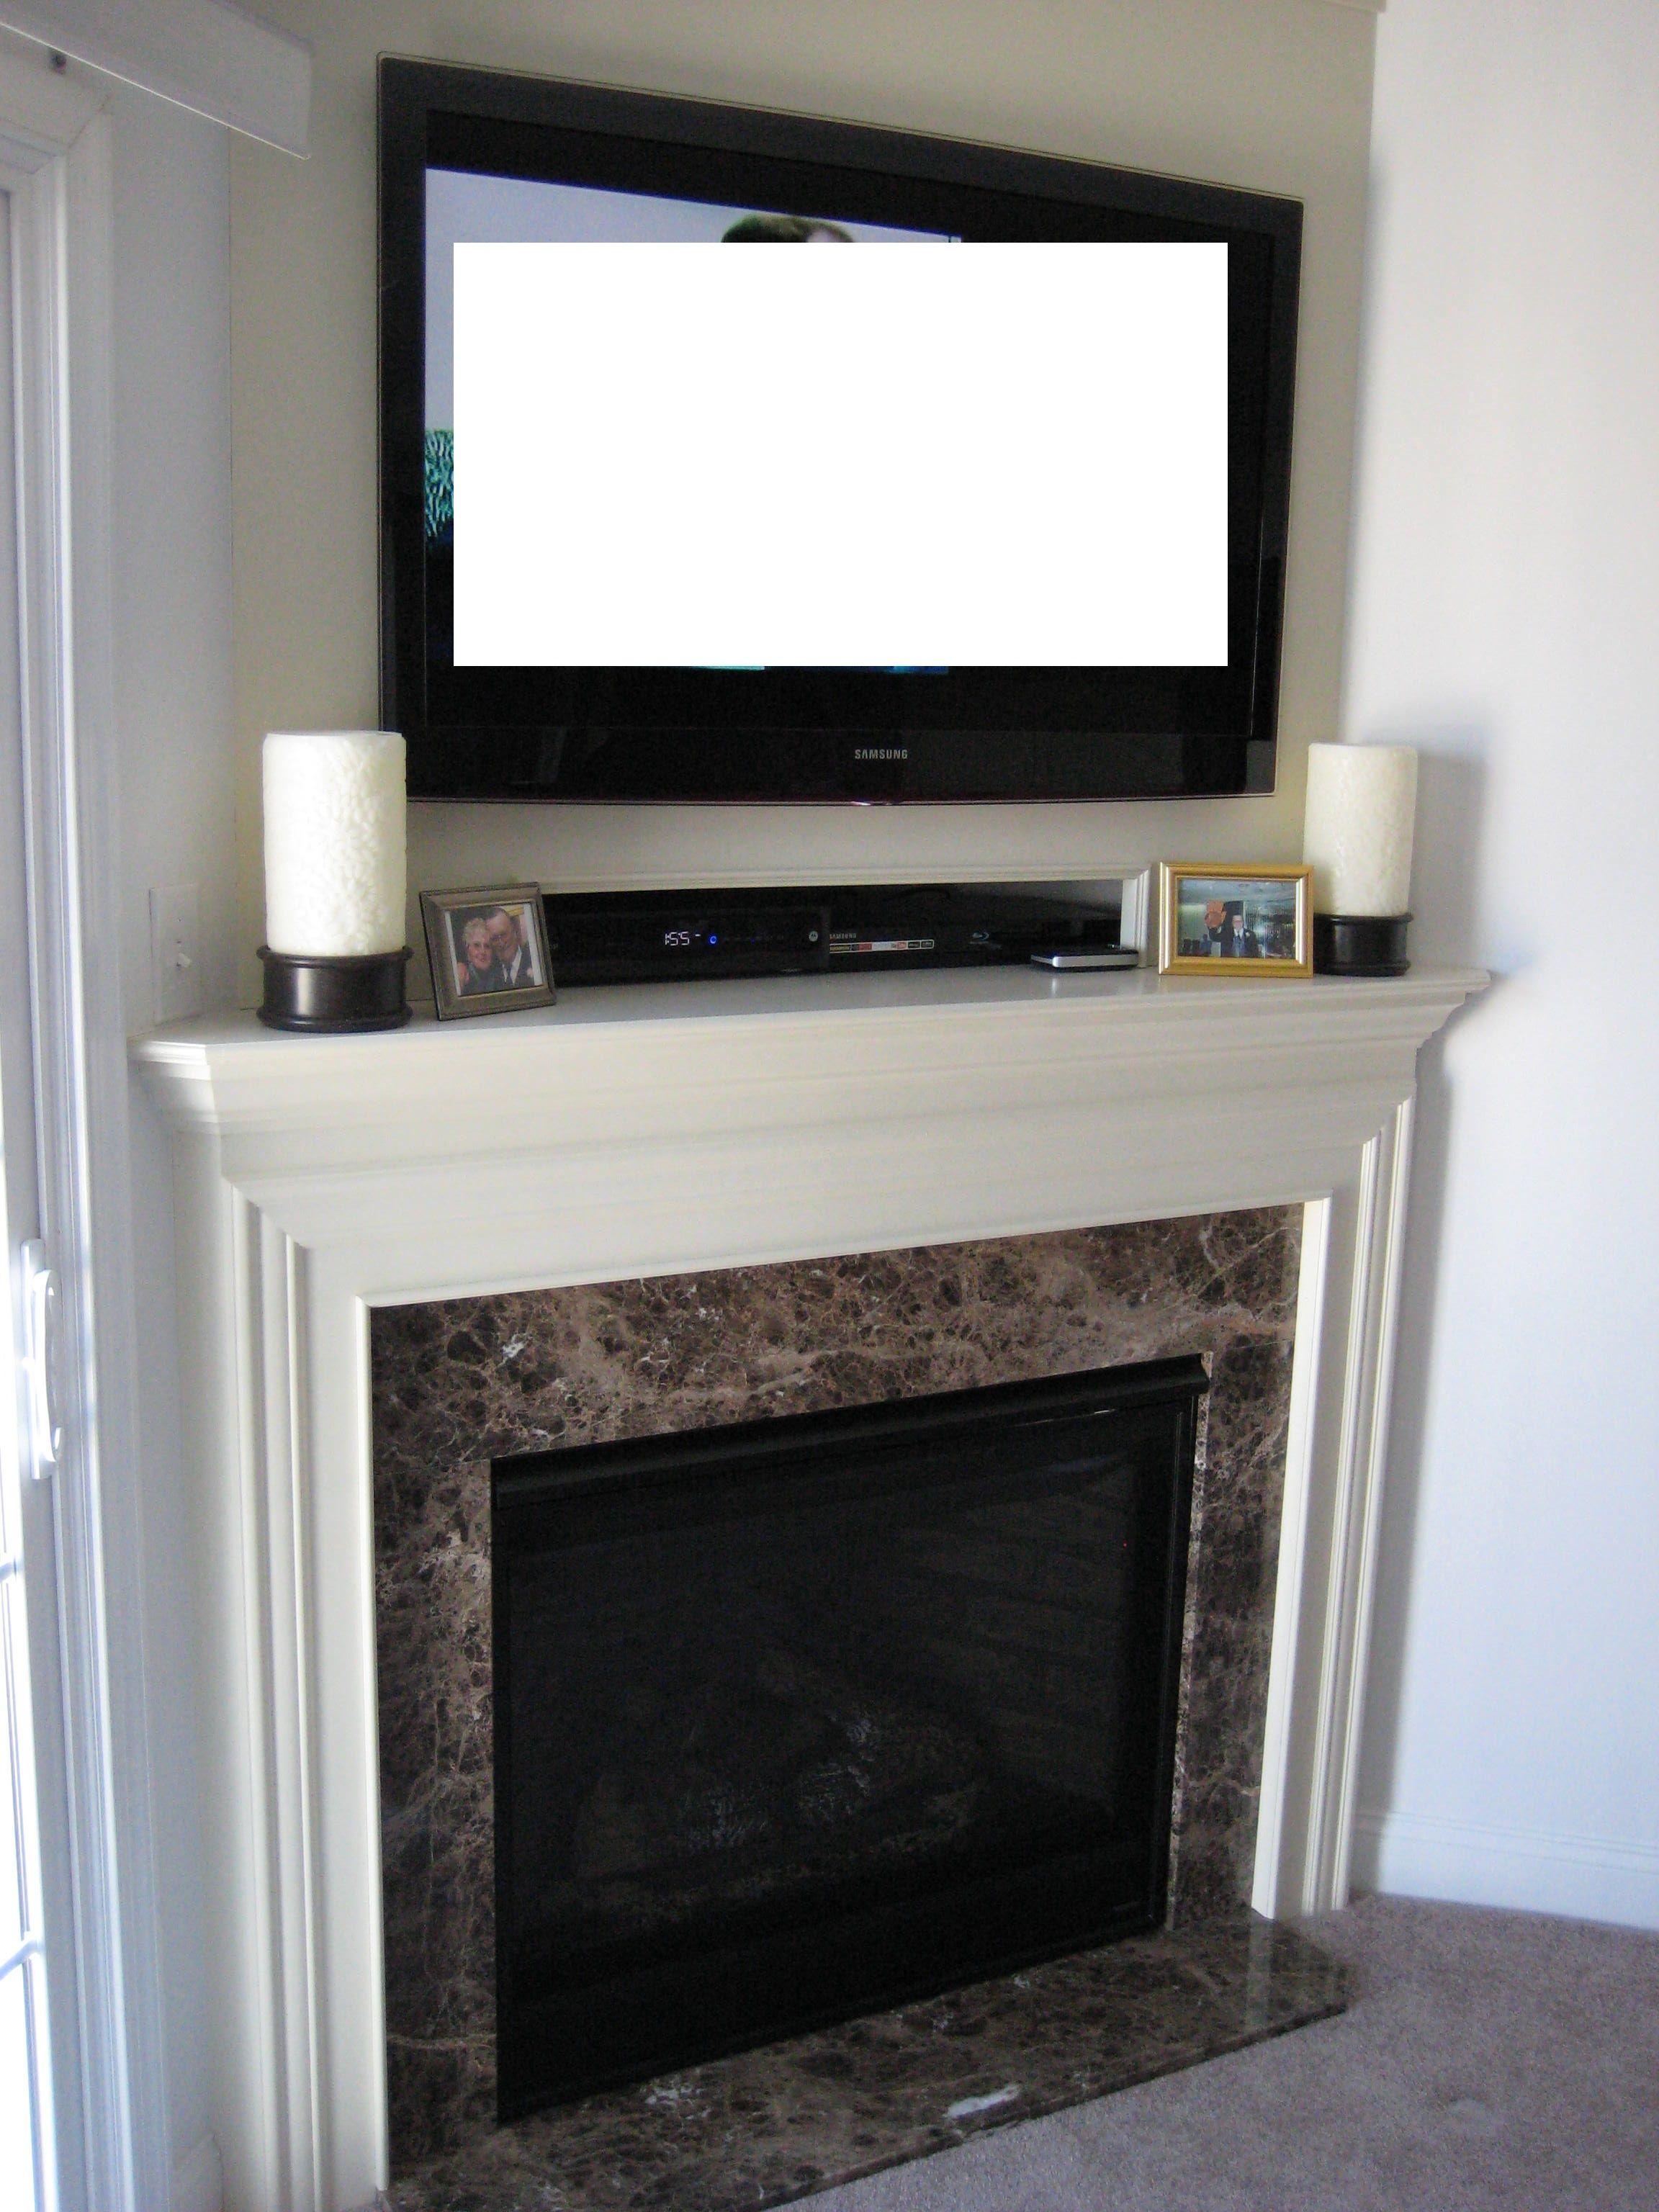 36 Novus Gas Fireplace By Rfs